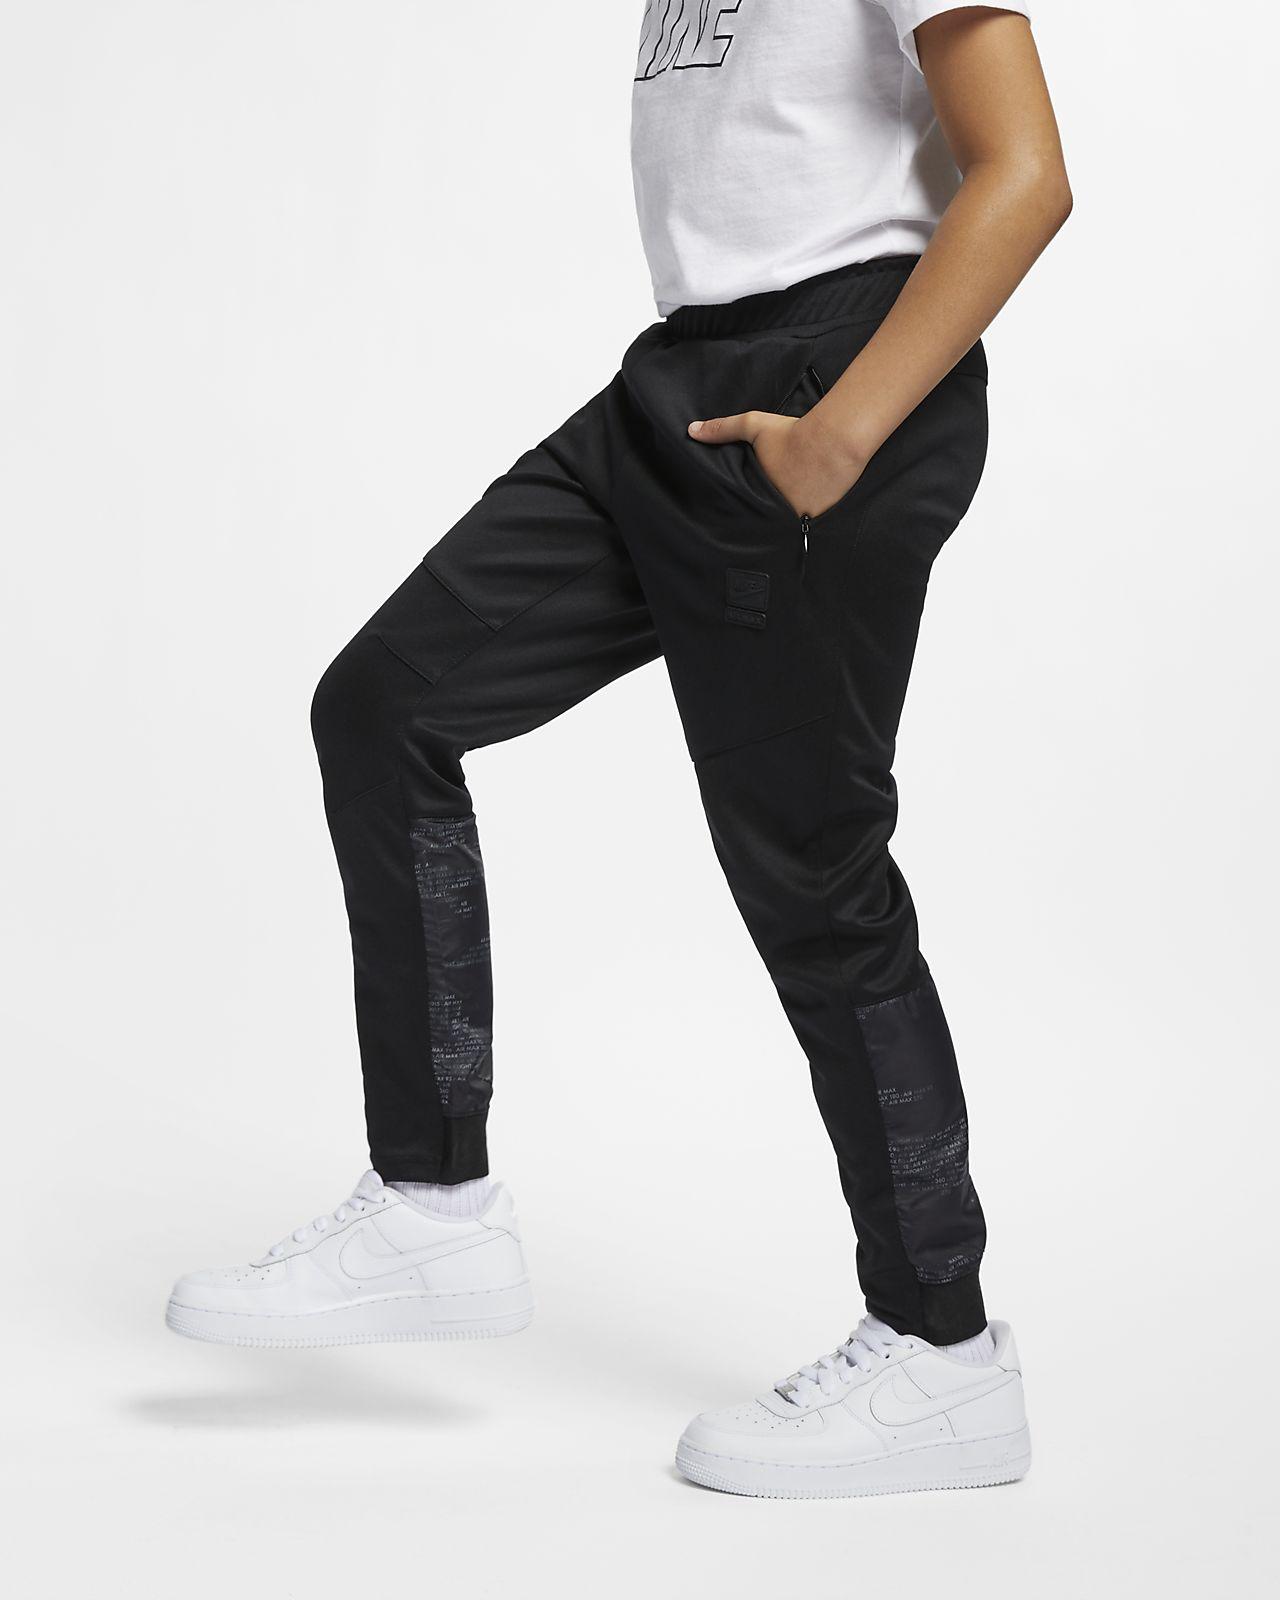 9f374c21 Nike Sportswear joggebukse til store barn (gutt). Nike.com NO